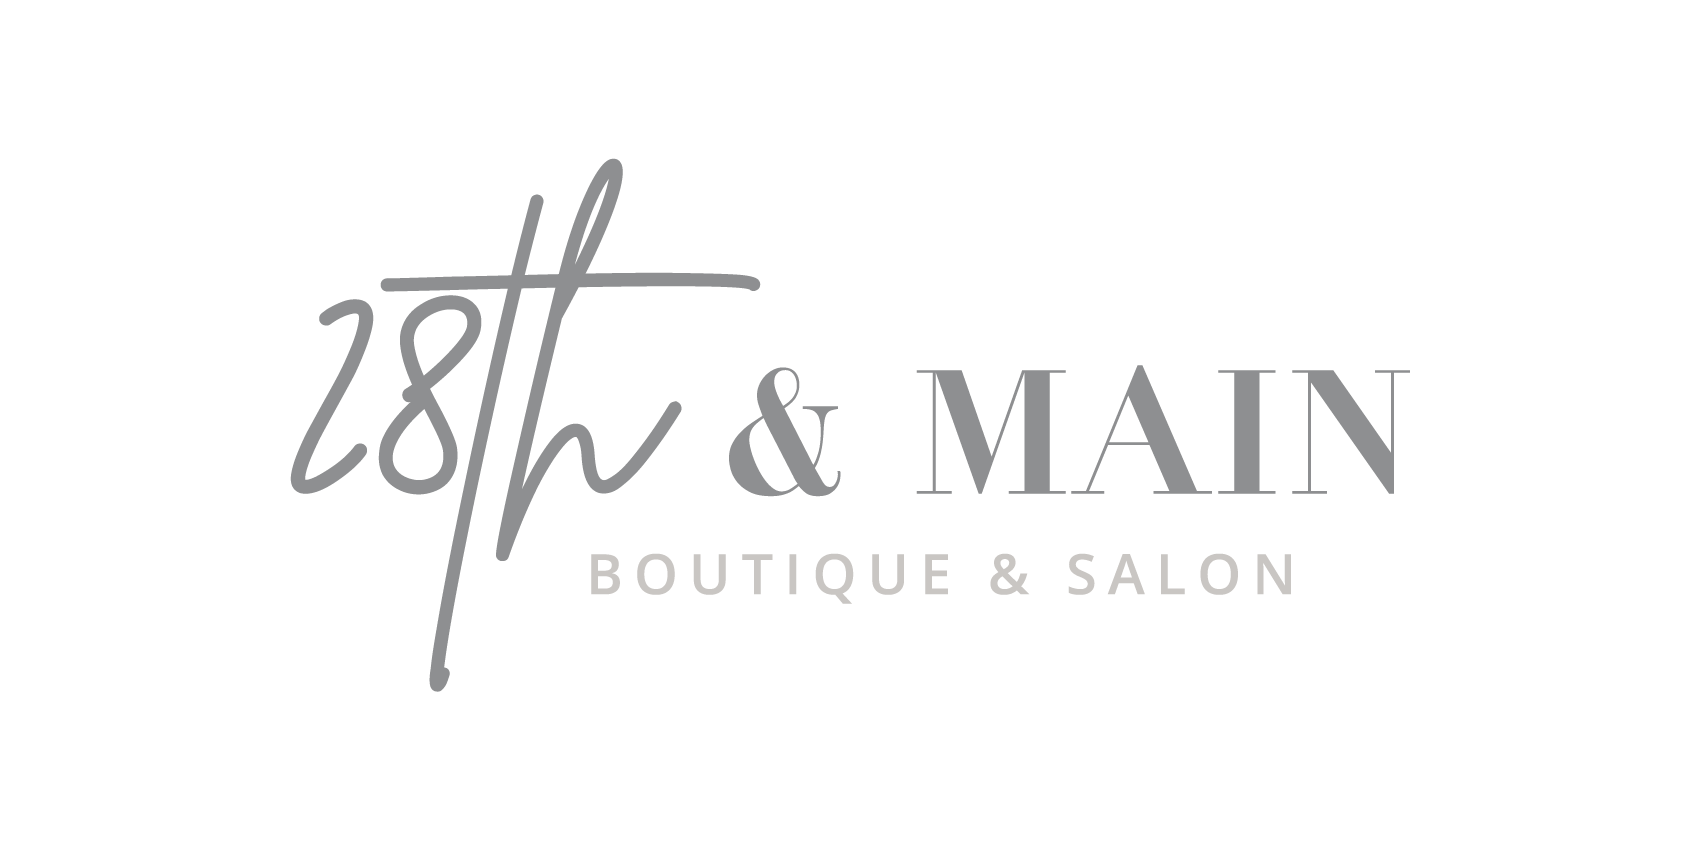 Small town boutique & salon needing its identity